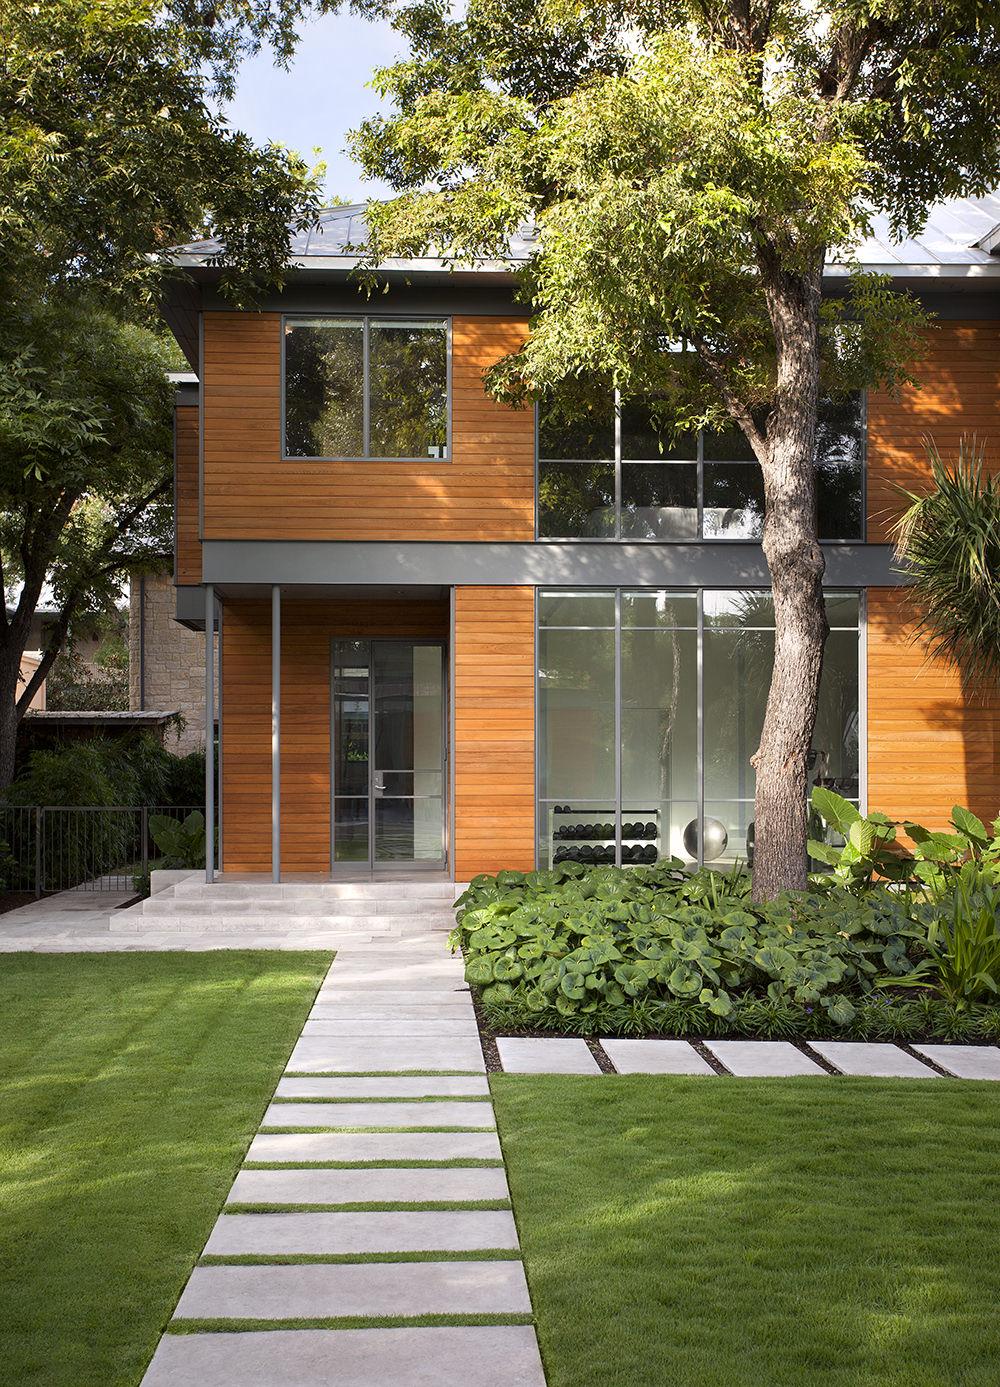 condon-residence-1.jpg